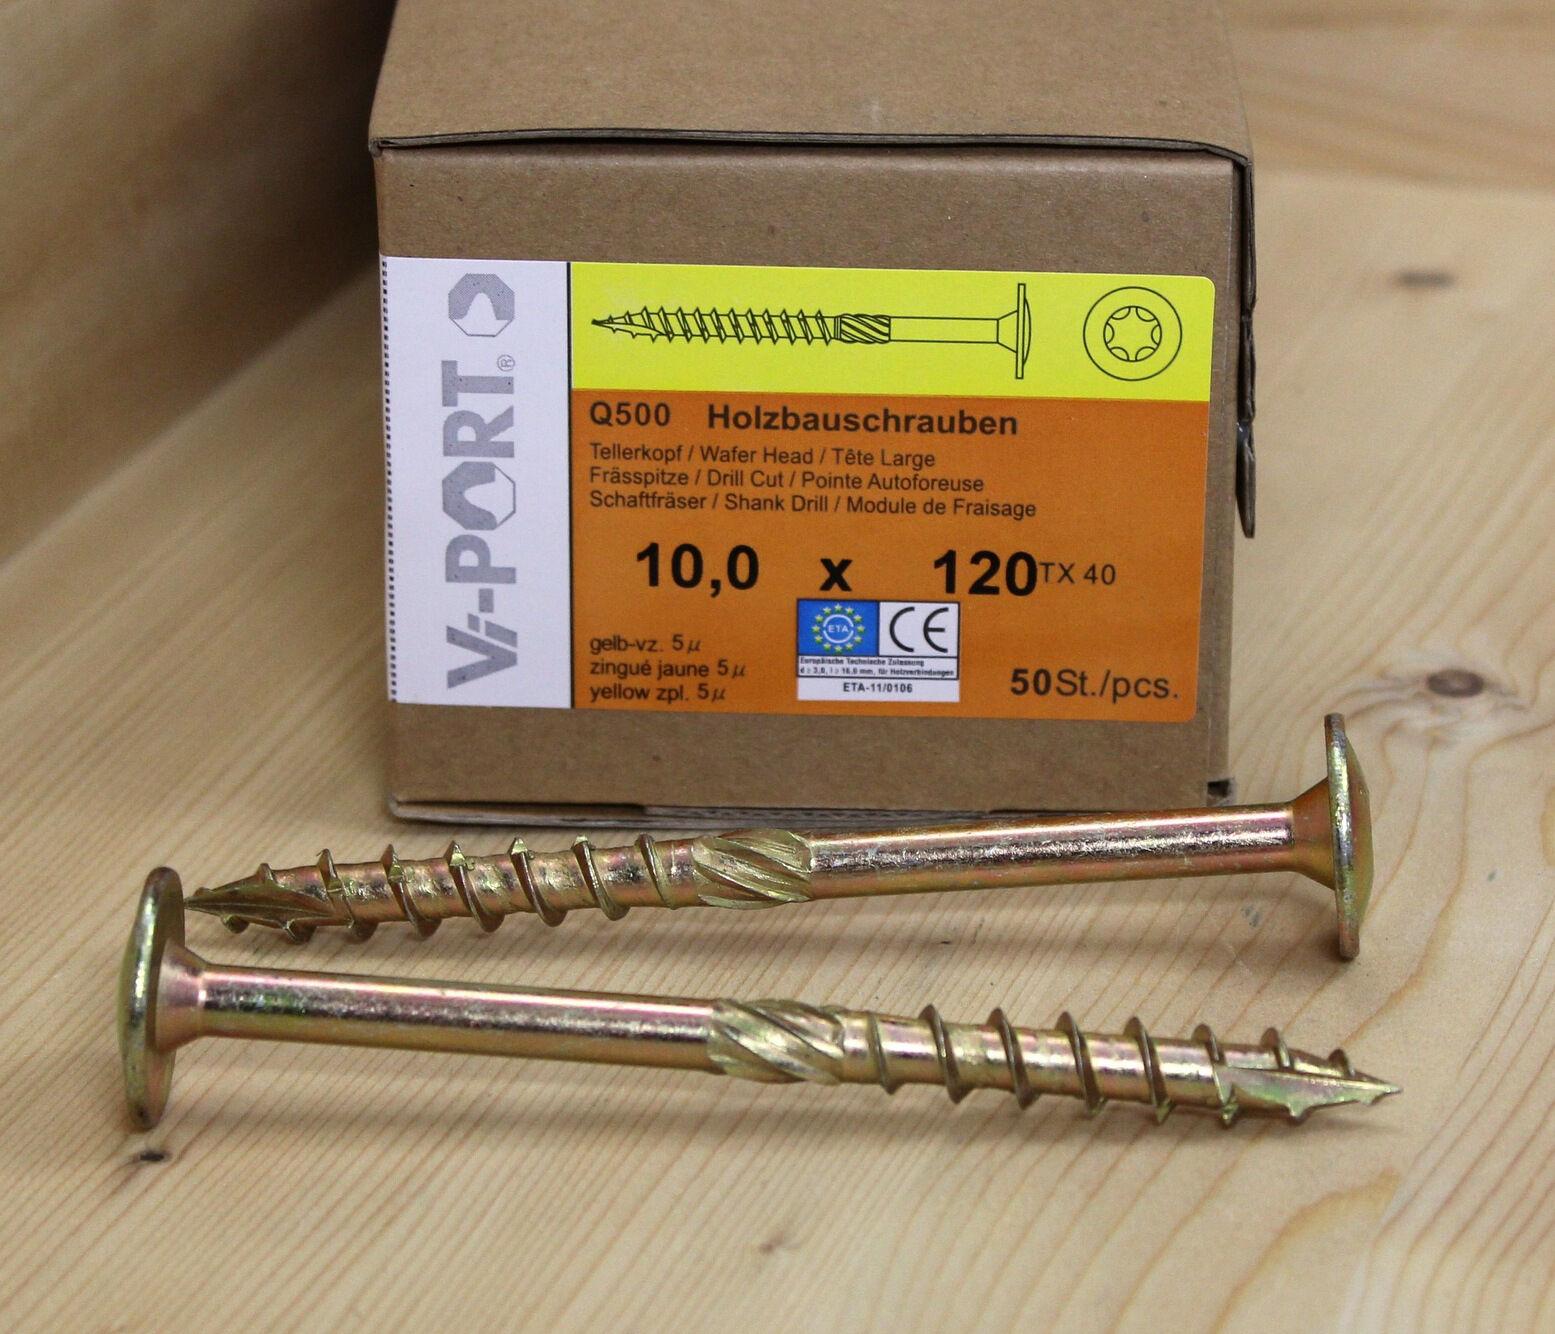 10 mm Vi-PORT® Tellerkopfschrauben EU-Zulassung Holzbauschrauben Tellerkopf TX40